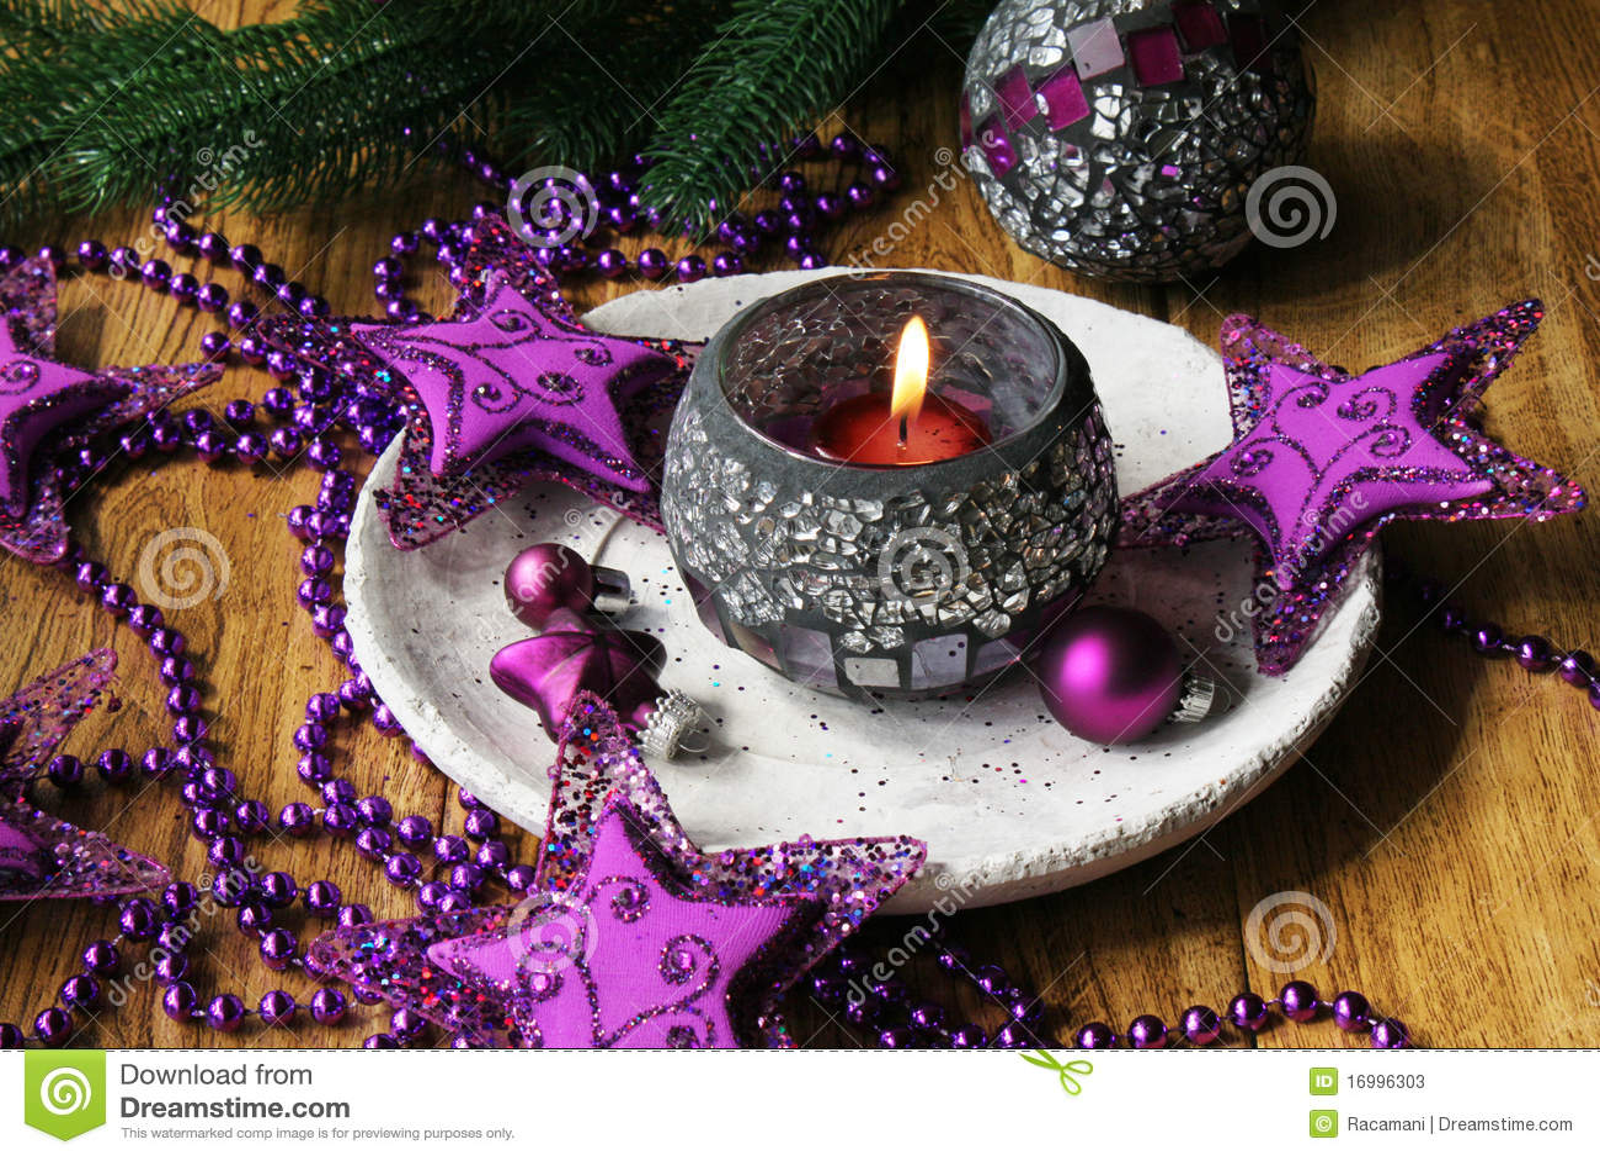 Purple table decorations for christmas - Purple Christmas Decorations Stock Photos Image 16996303